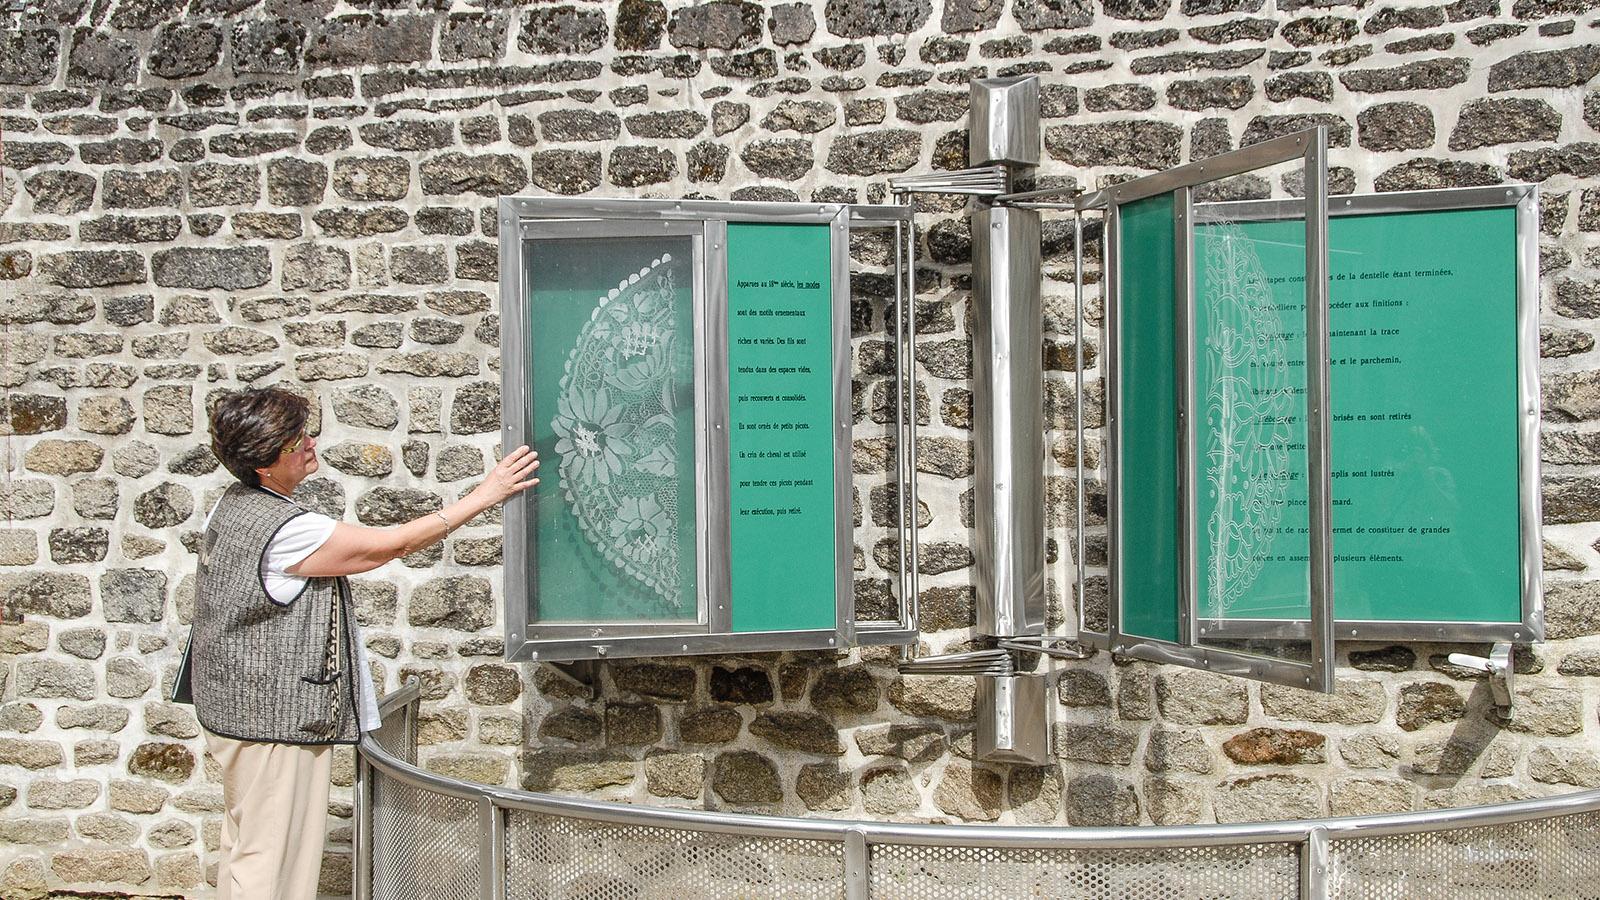 Nadelspitze aus Alençon: Die Schautalfeln des Museums. Foto: Hilke Maunder